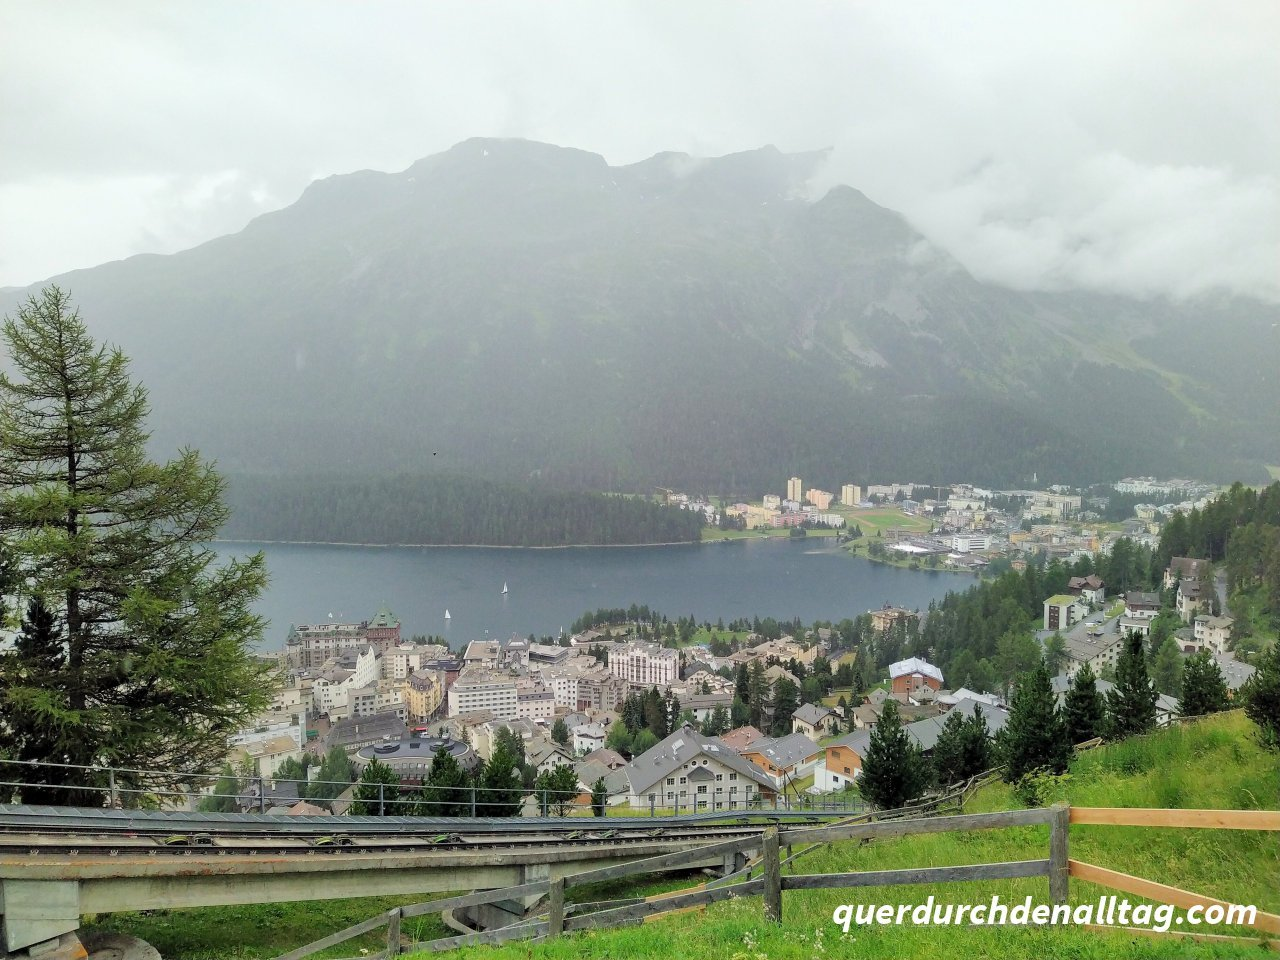 Chantarella St. Moritz